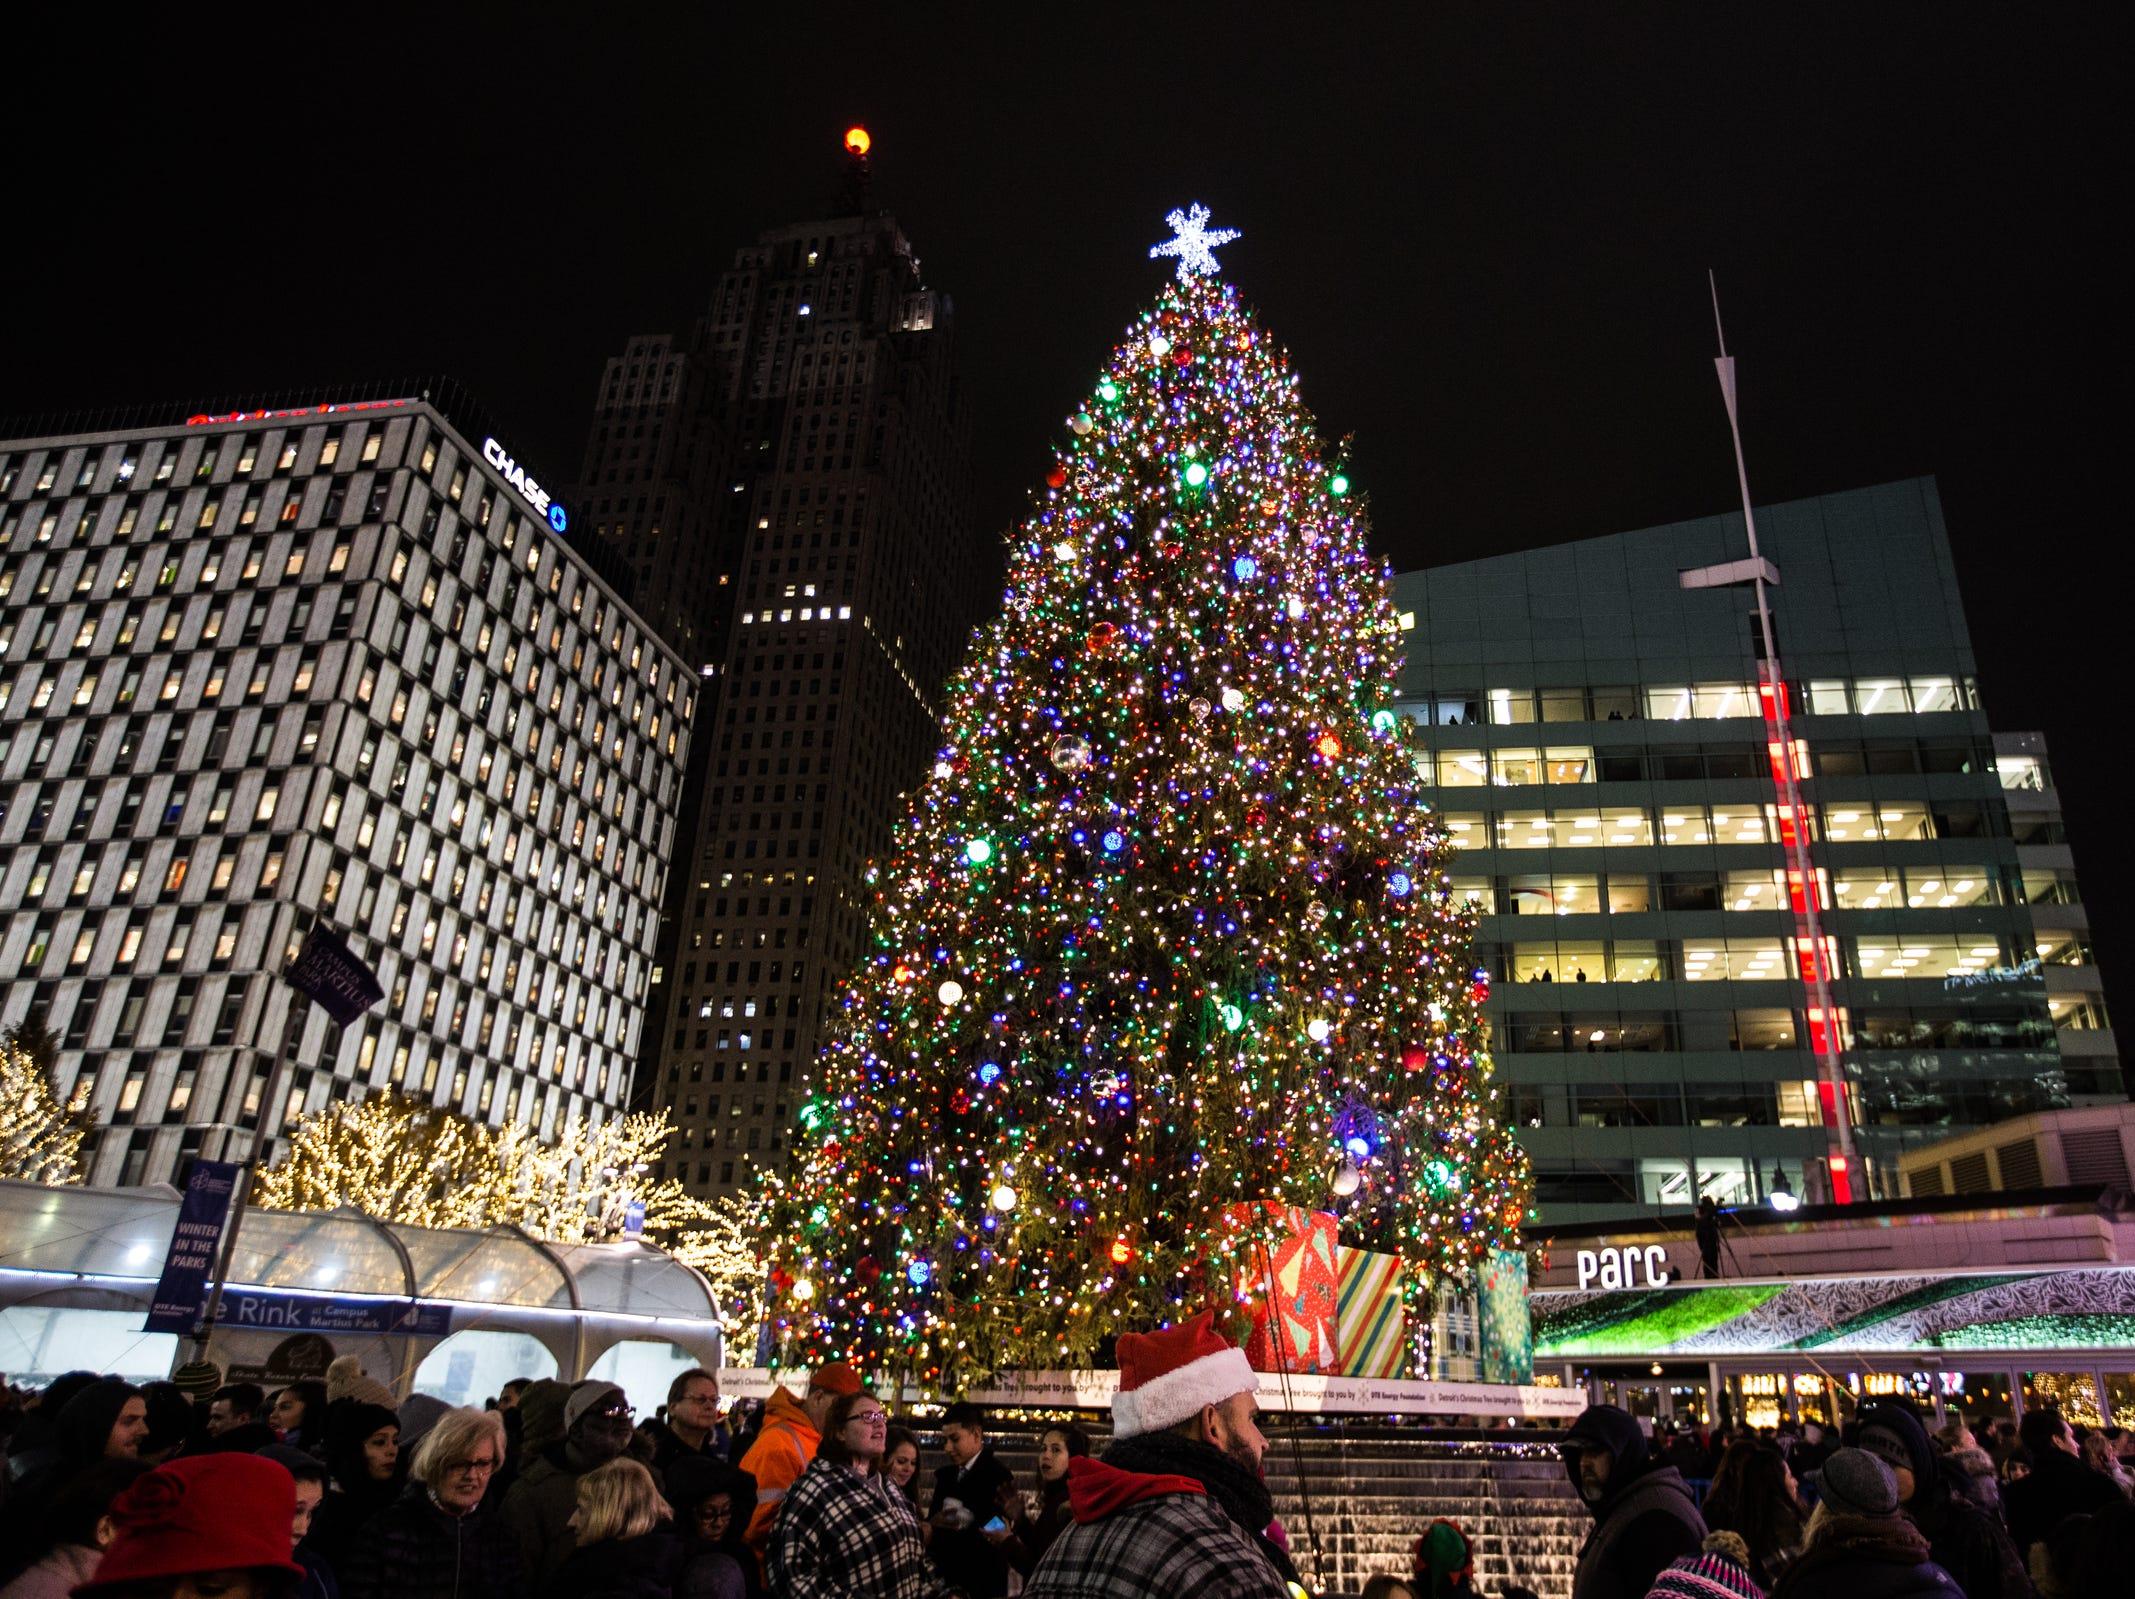 Holiday spirit fills Detroit during annual tree lighting